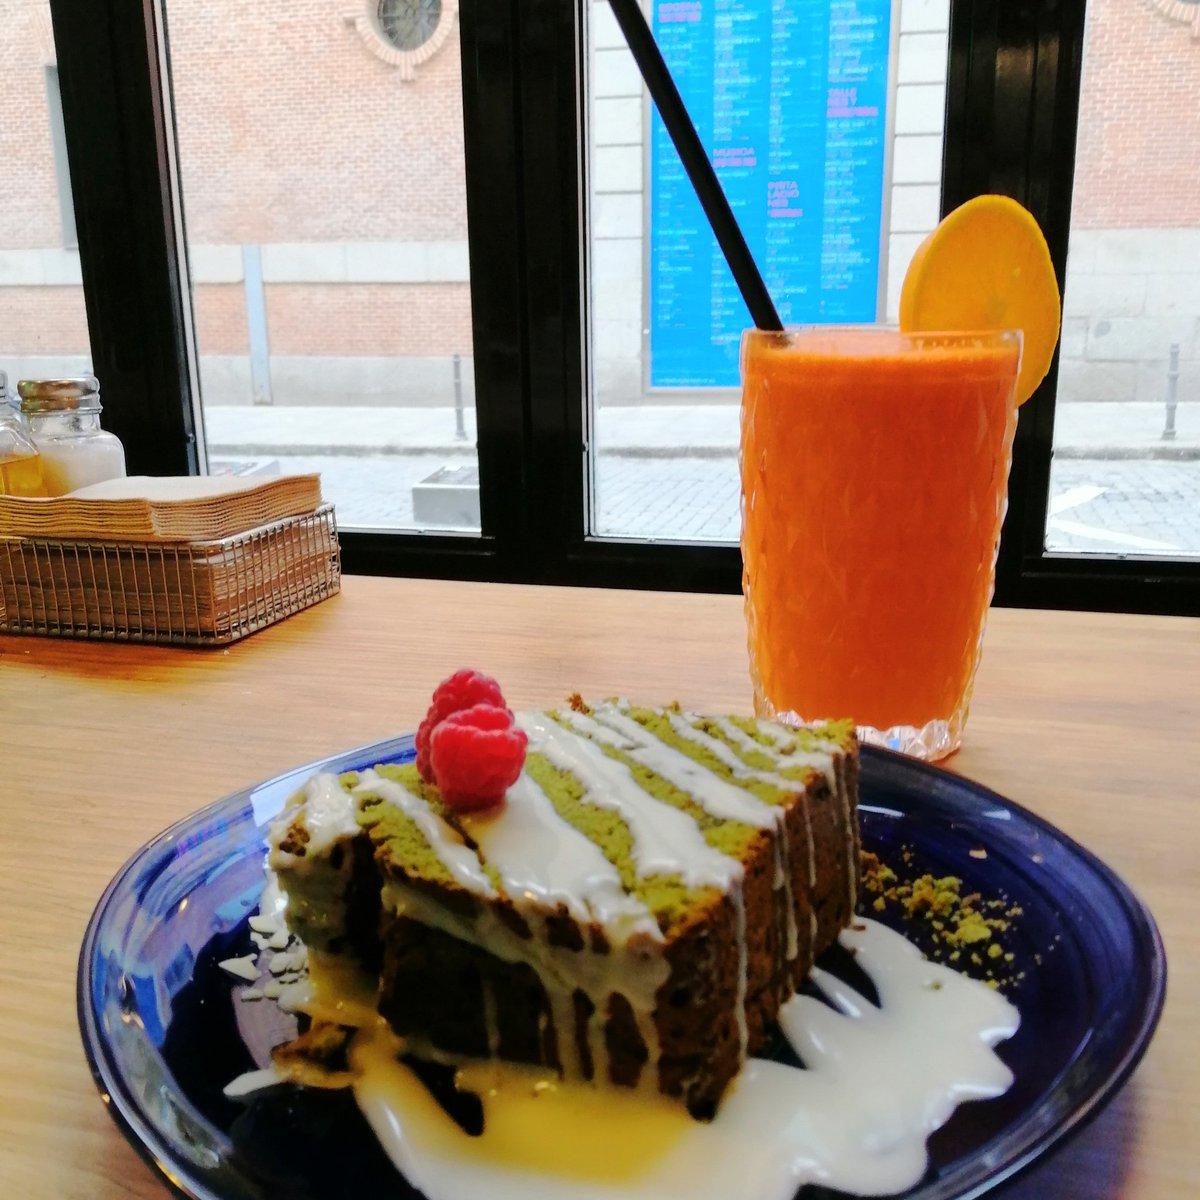 #antigripal de hoy: zumo de naranja+zanahoria+jengibre; tarta matcha+choco blanco